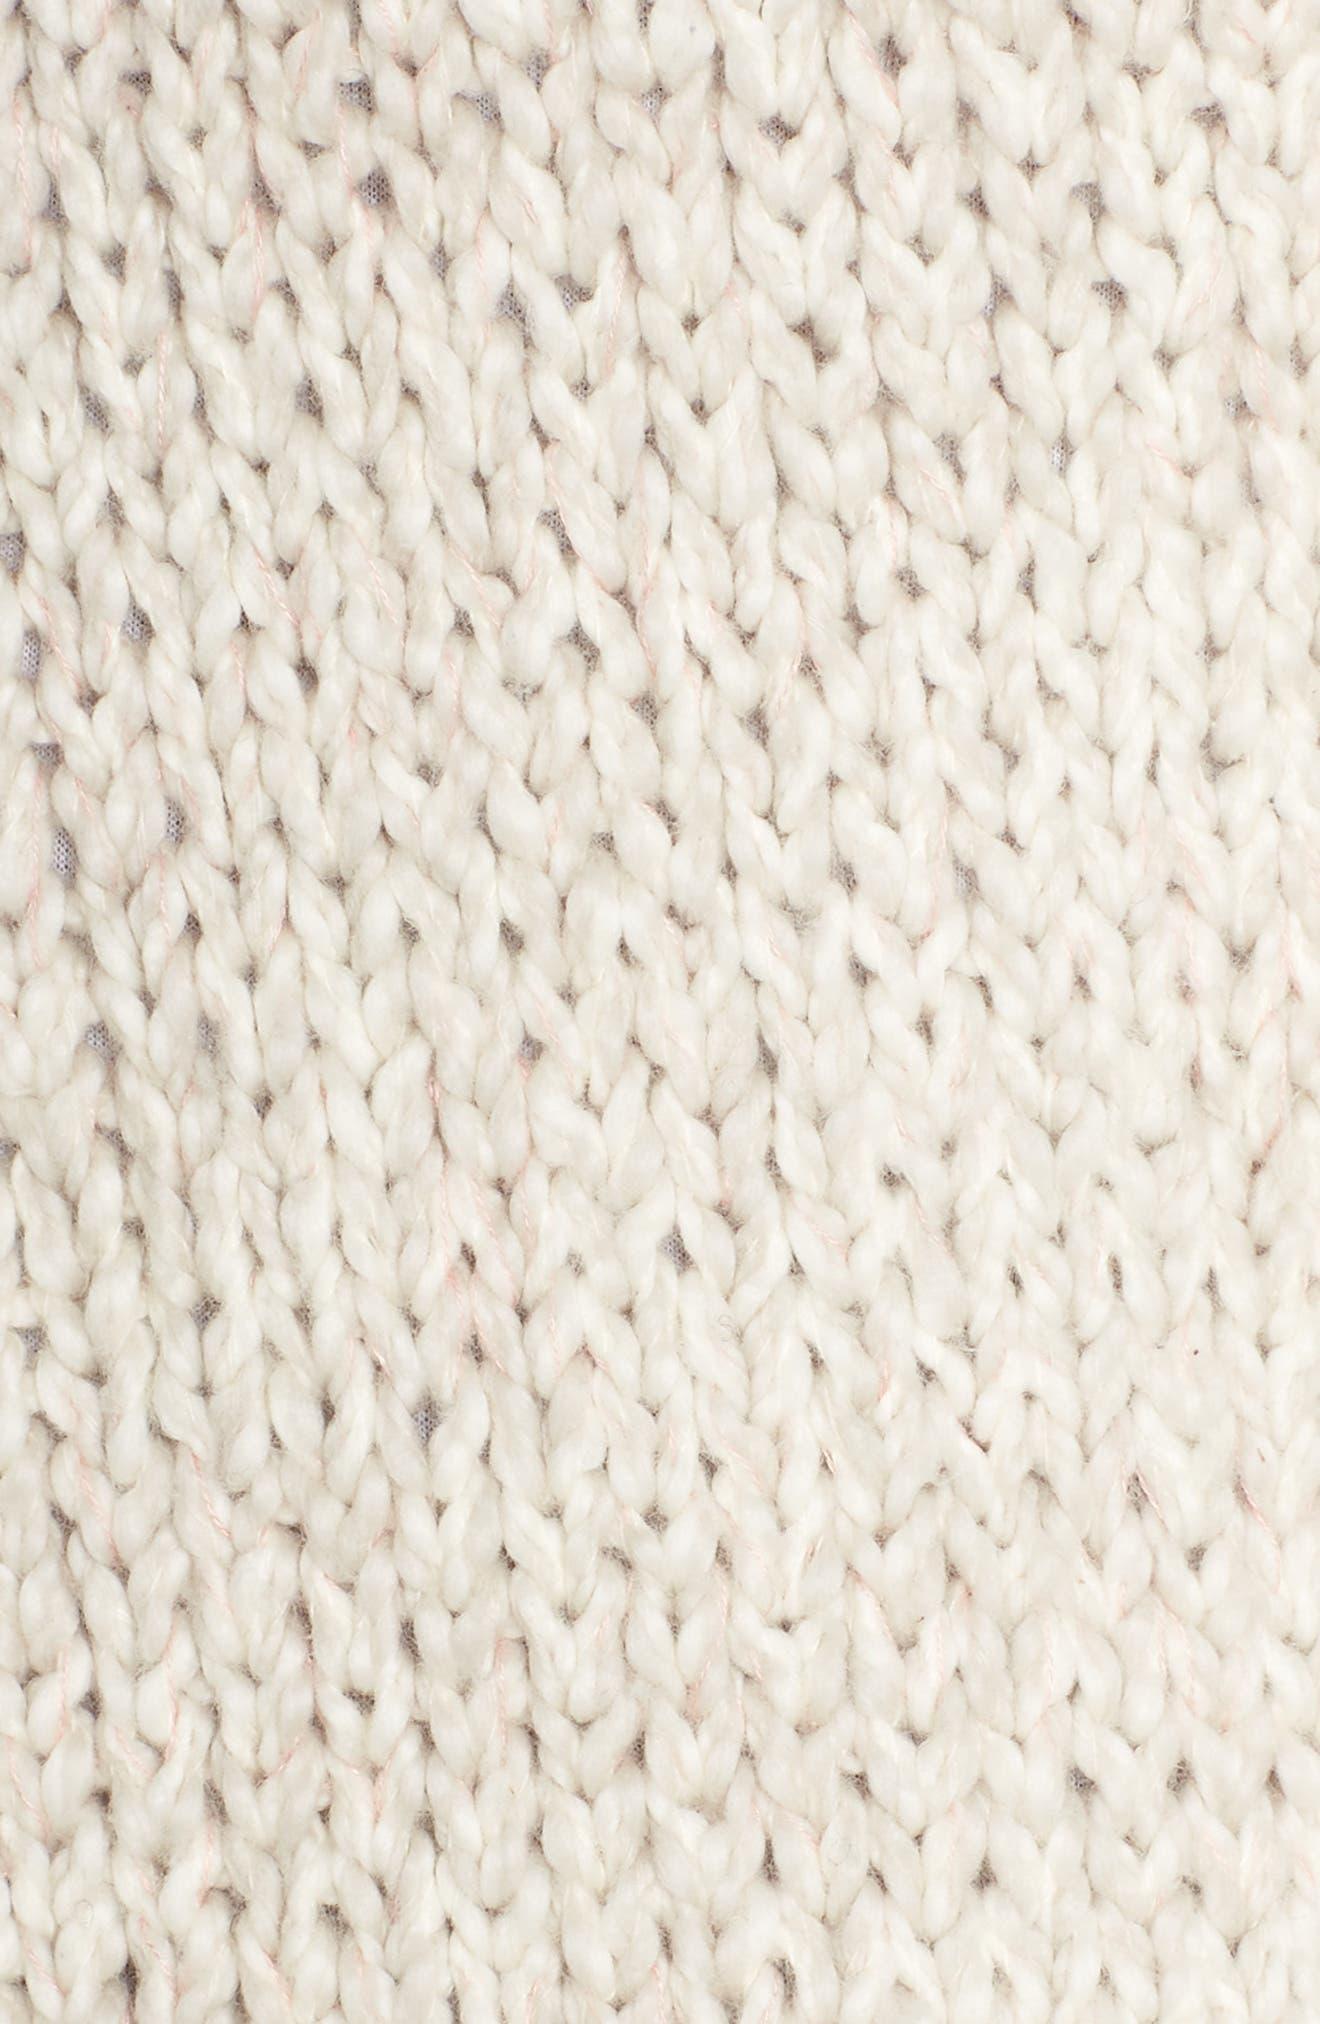 Kadia Organic Cotton Wrap,                             Alternate thumbnail 5, color,                             900